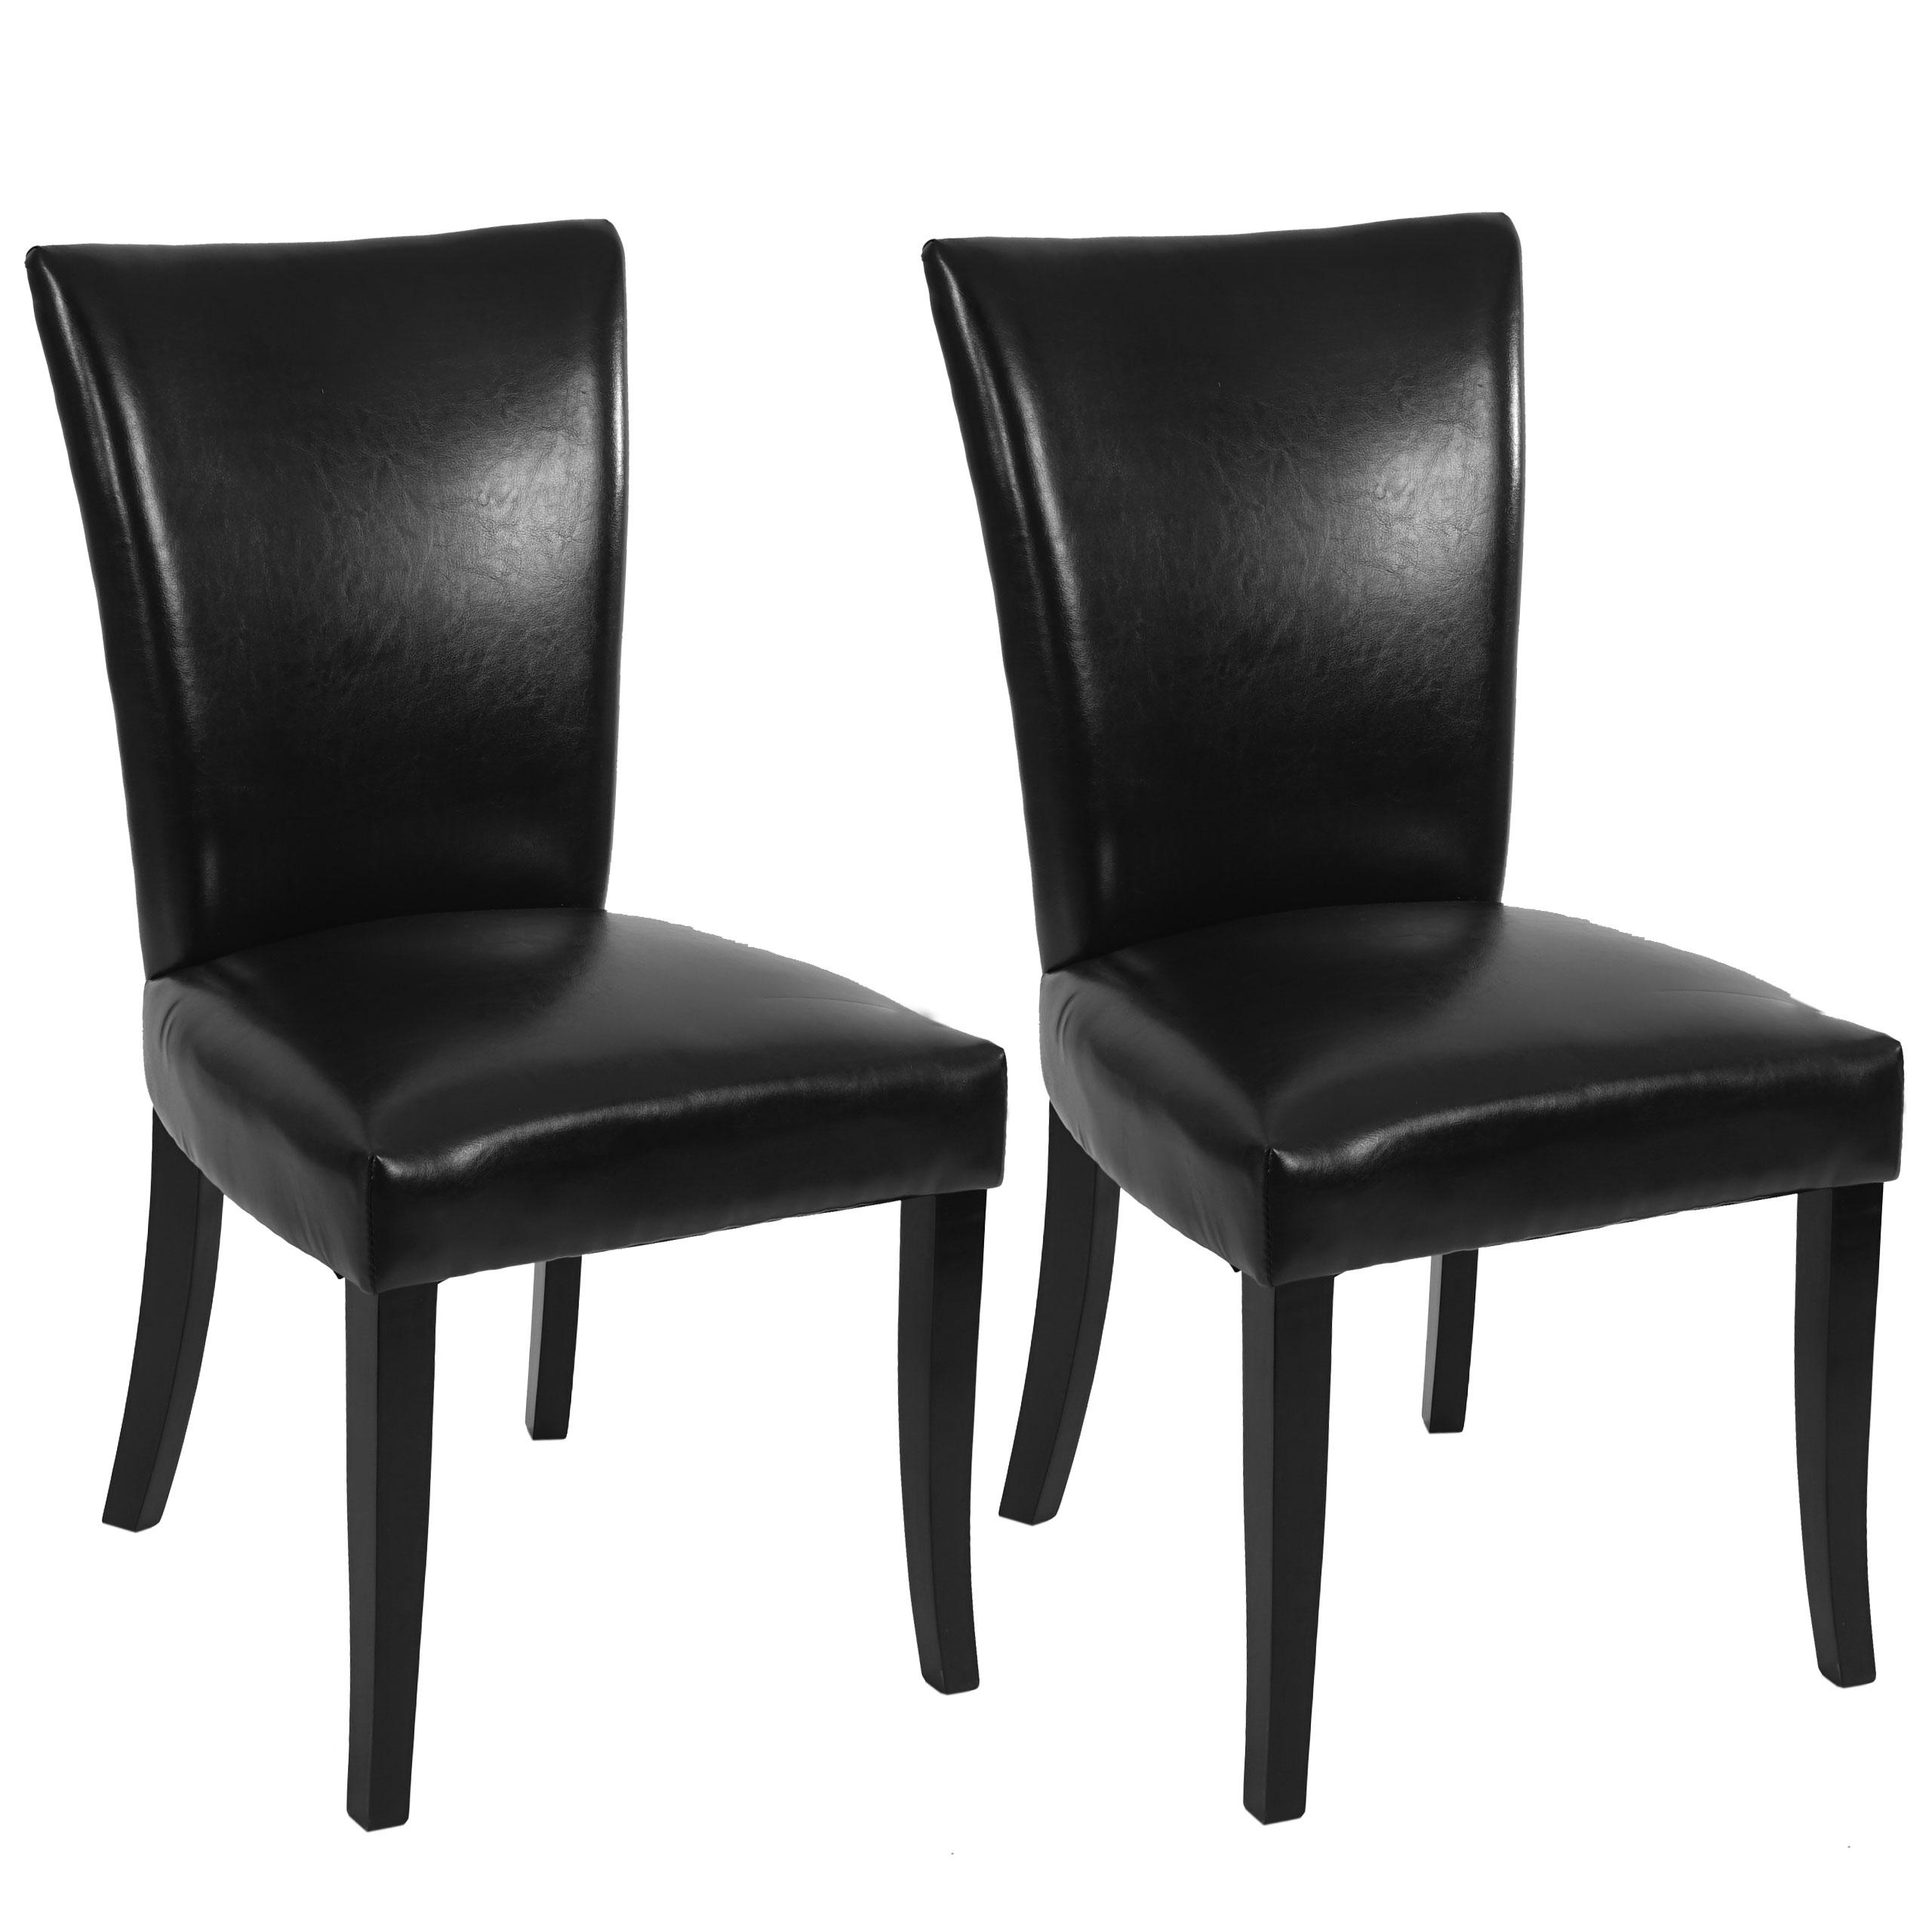 2x esszimmerstuhl chesterfield stuhl lehnstuhl nieten kunstleder schwarz dunkle beine. Black Bedroom Furniture Sets. Home Design Ideas